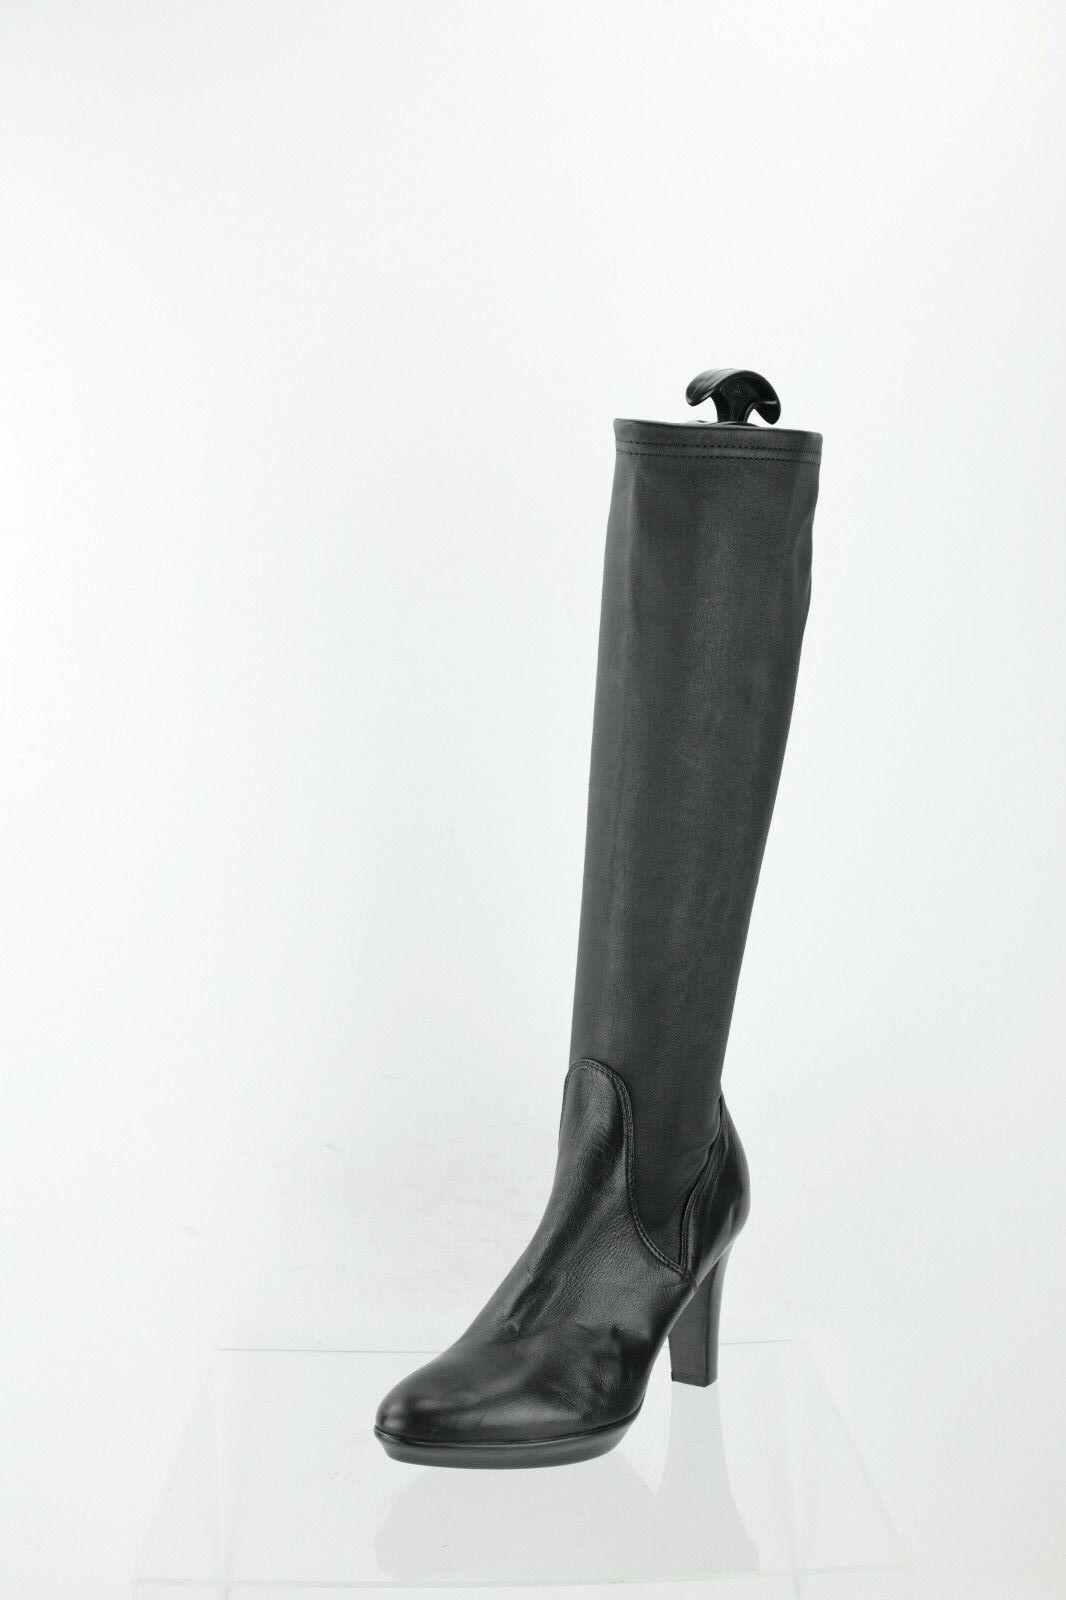 Aquatalia Rumbah Black Leather Knee High Boots Women's Shoes Size 5.5 M NEW